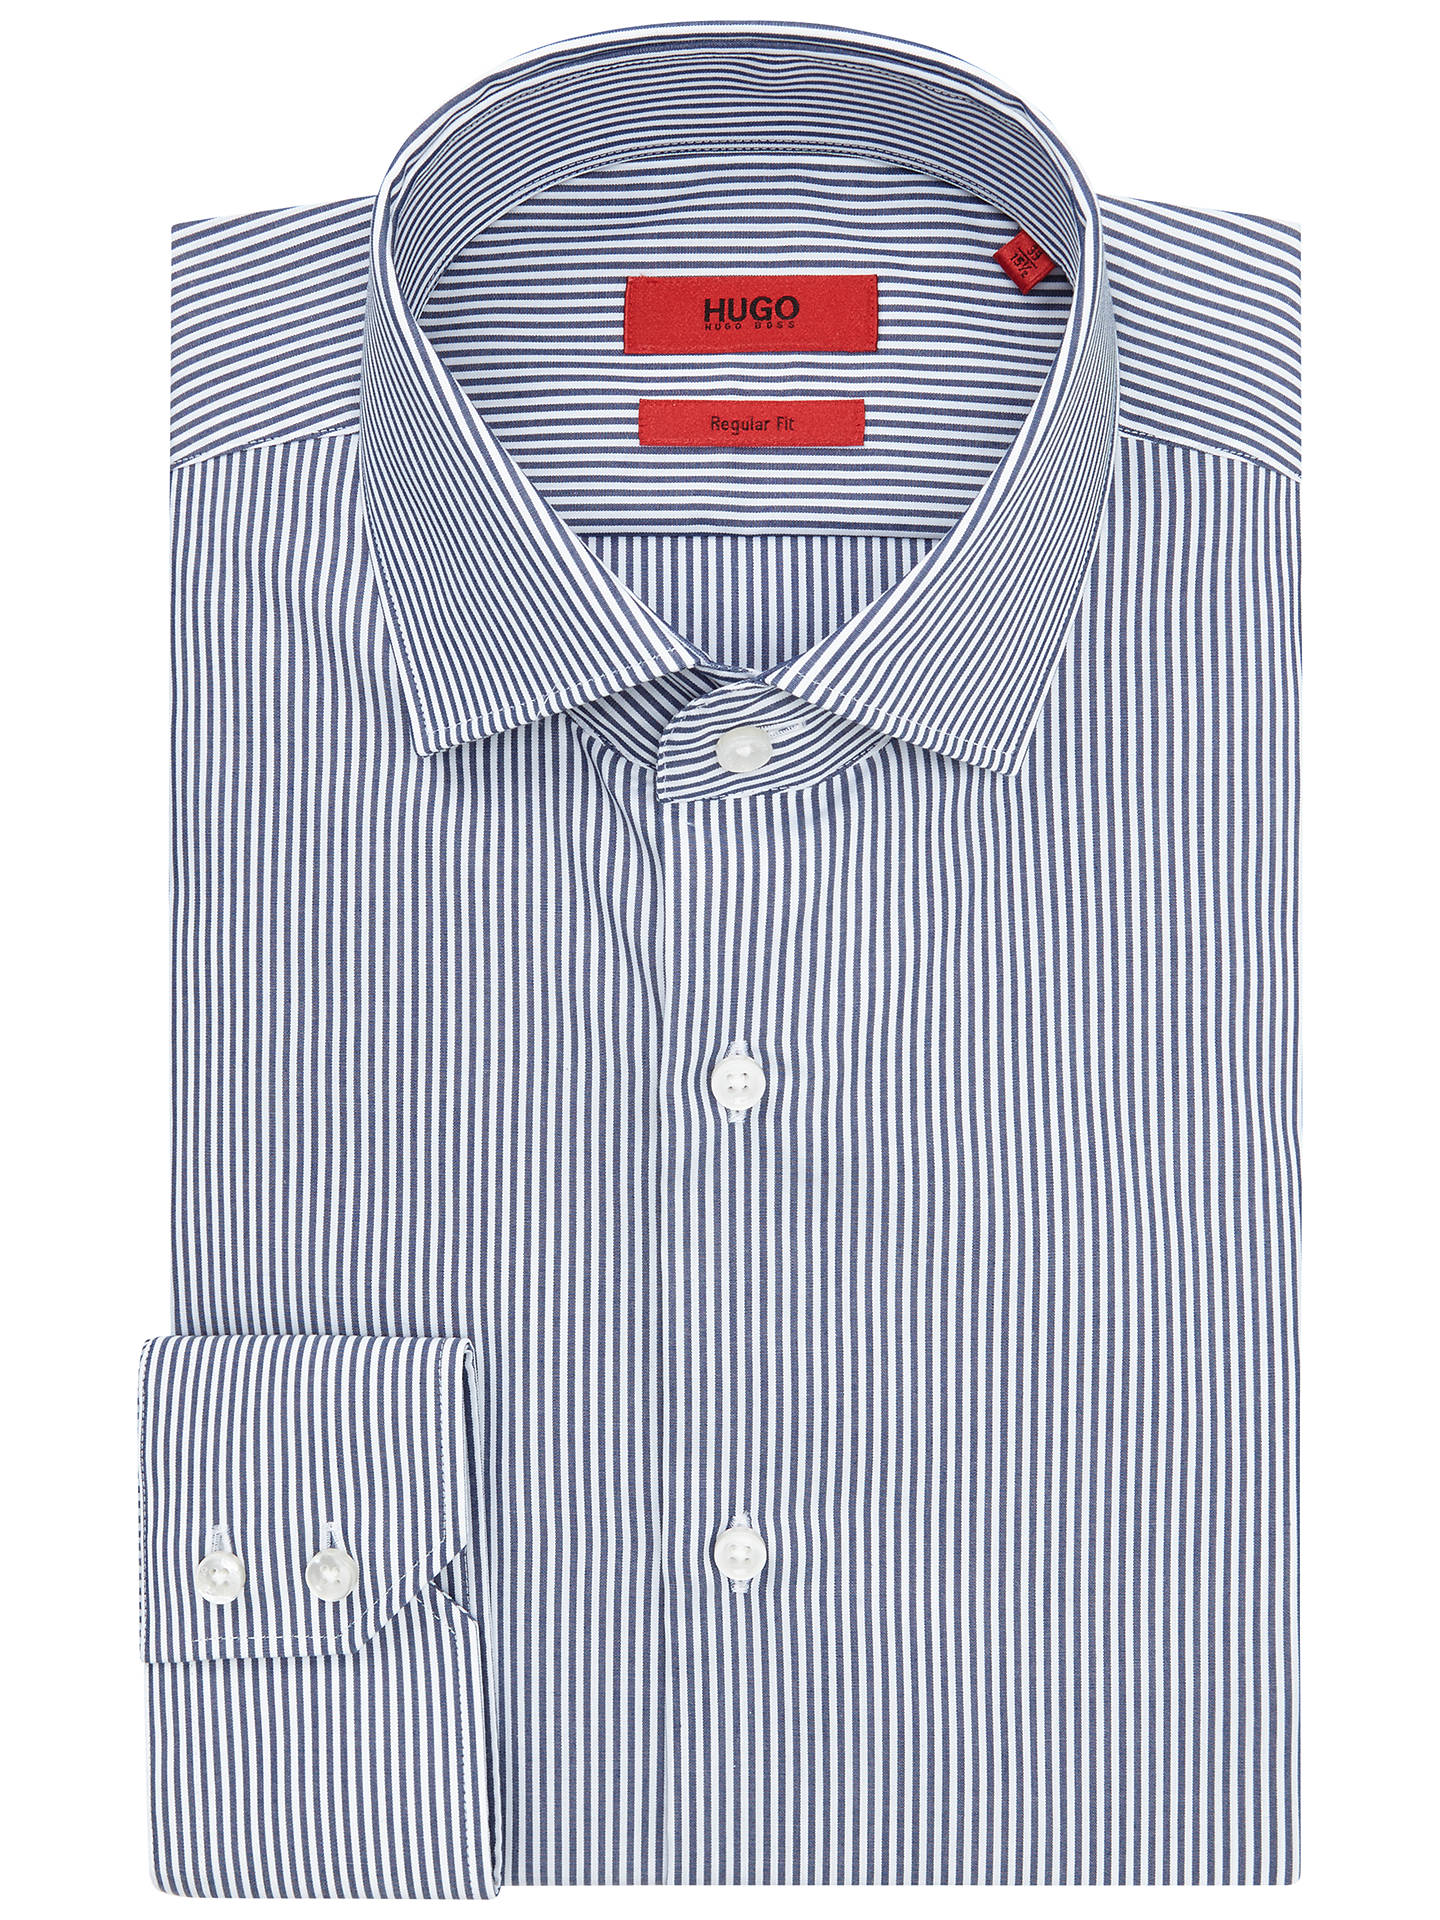 5e6df14a4 Buy HUGO by Hugo Boss C-Gordon Easy Iron Cotton Stripe Shirt, Navy, ...